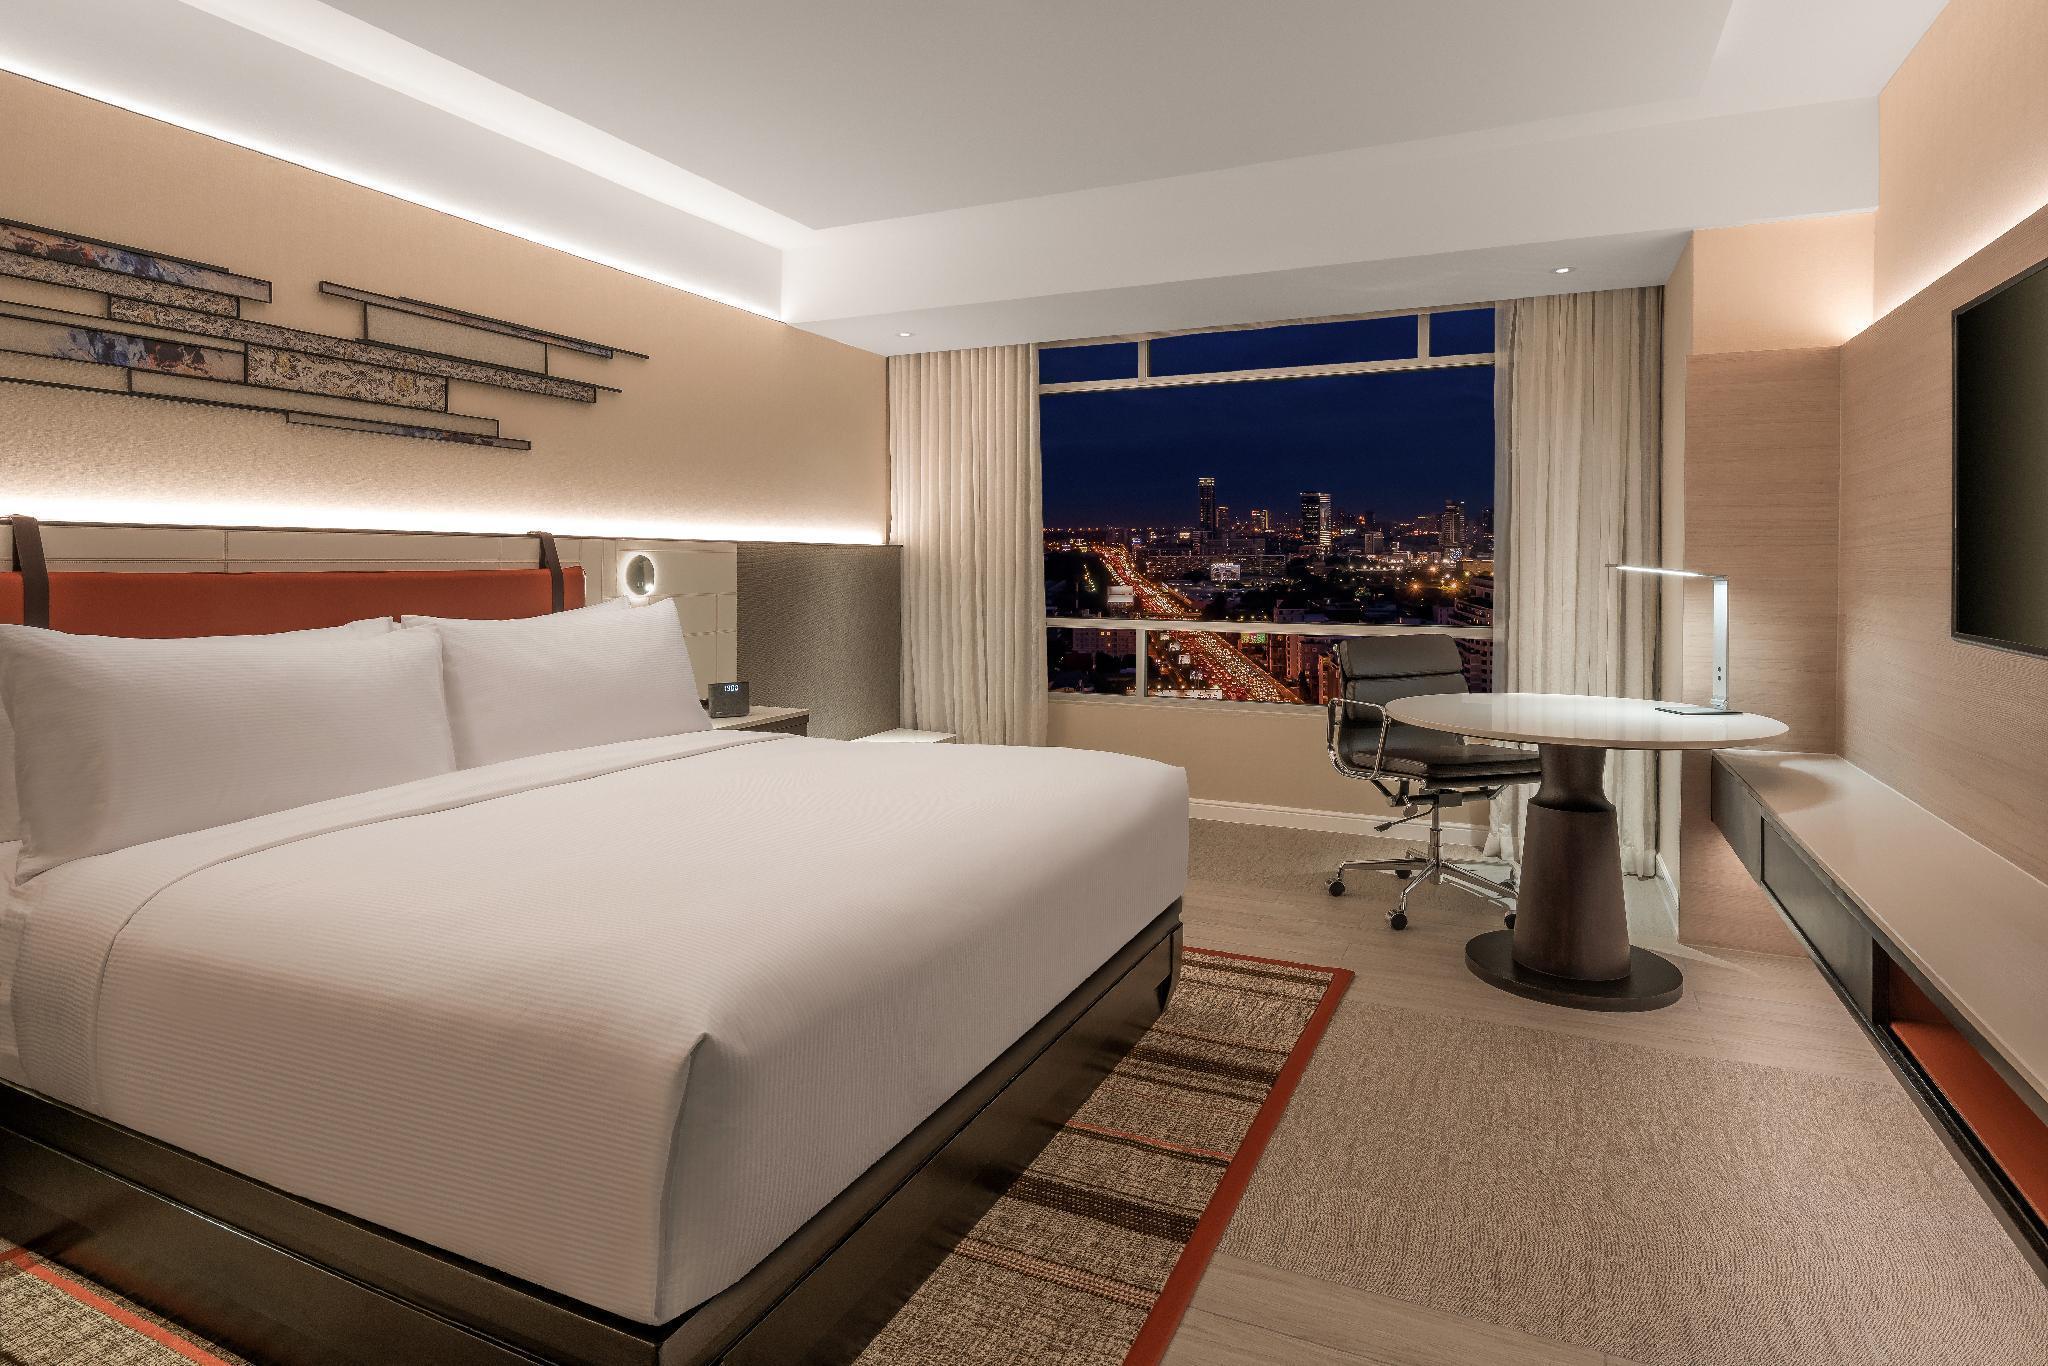 DoubleTree by Hilton Bangkok Ploenchit ดับเบิลทรี บาย ฮิลตัน แบงค็อก เพลินจิต